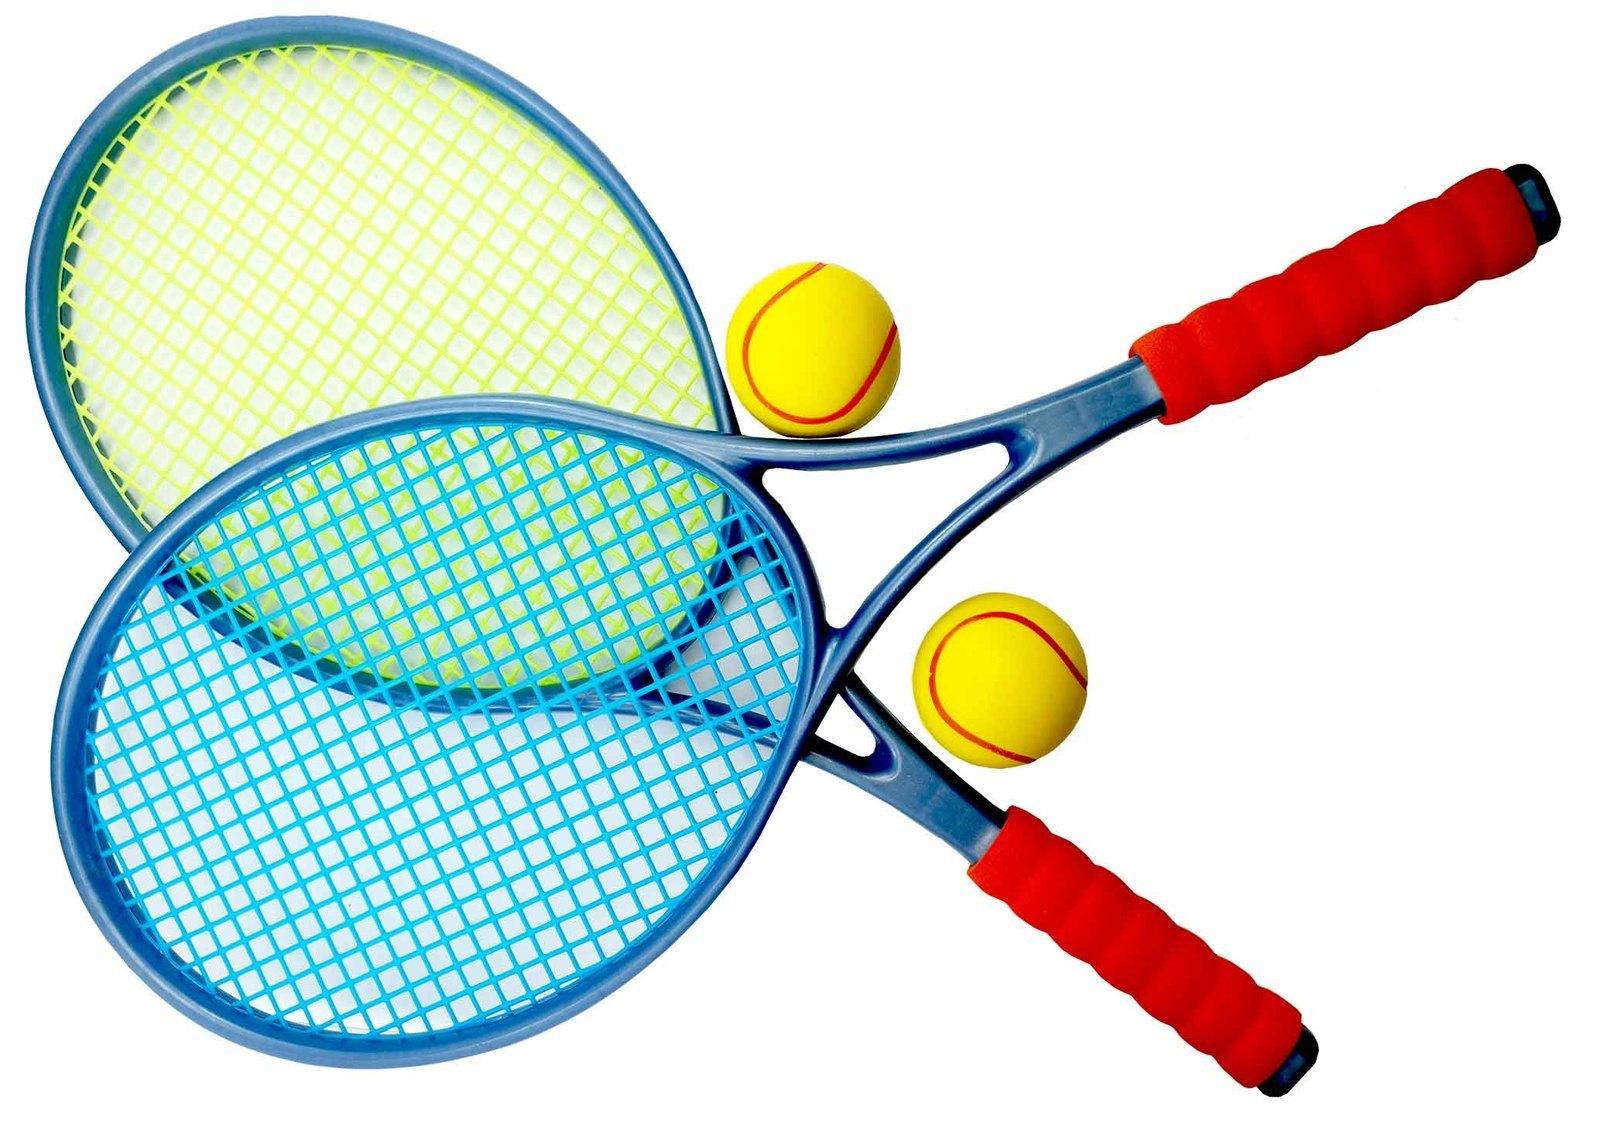 Wahu: Summer Tennis Set image